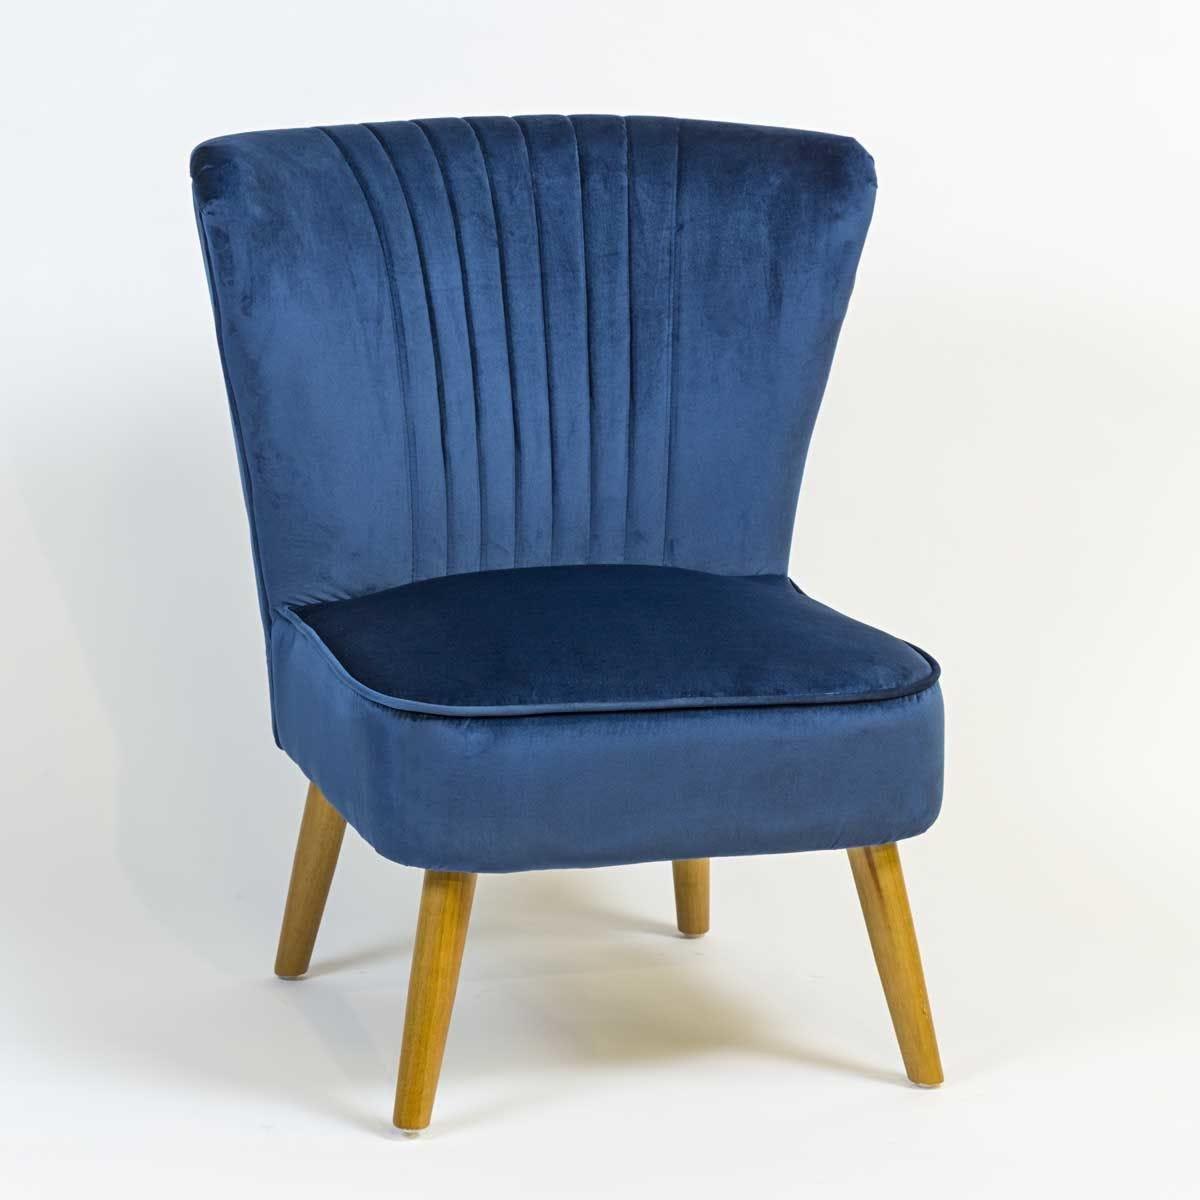 Shilaya Chair - Blue